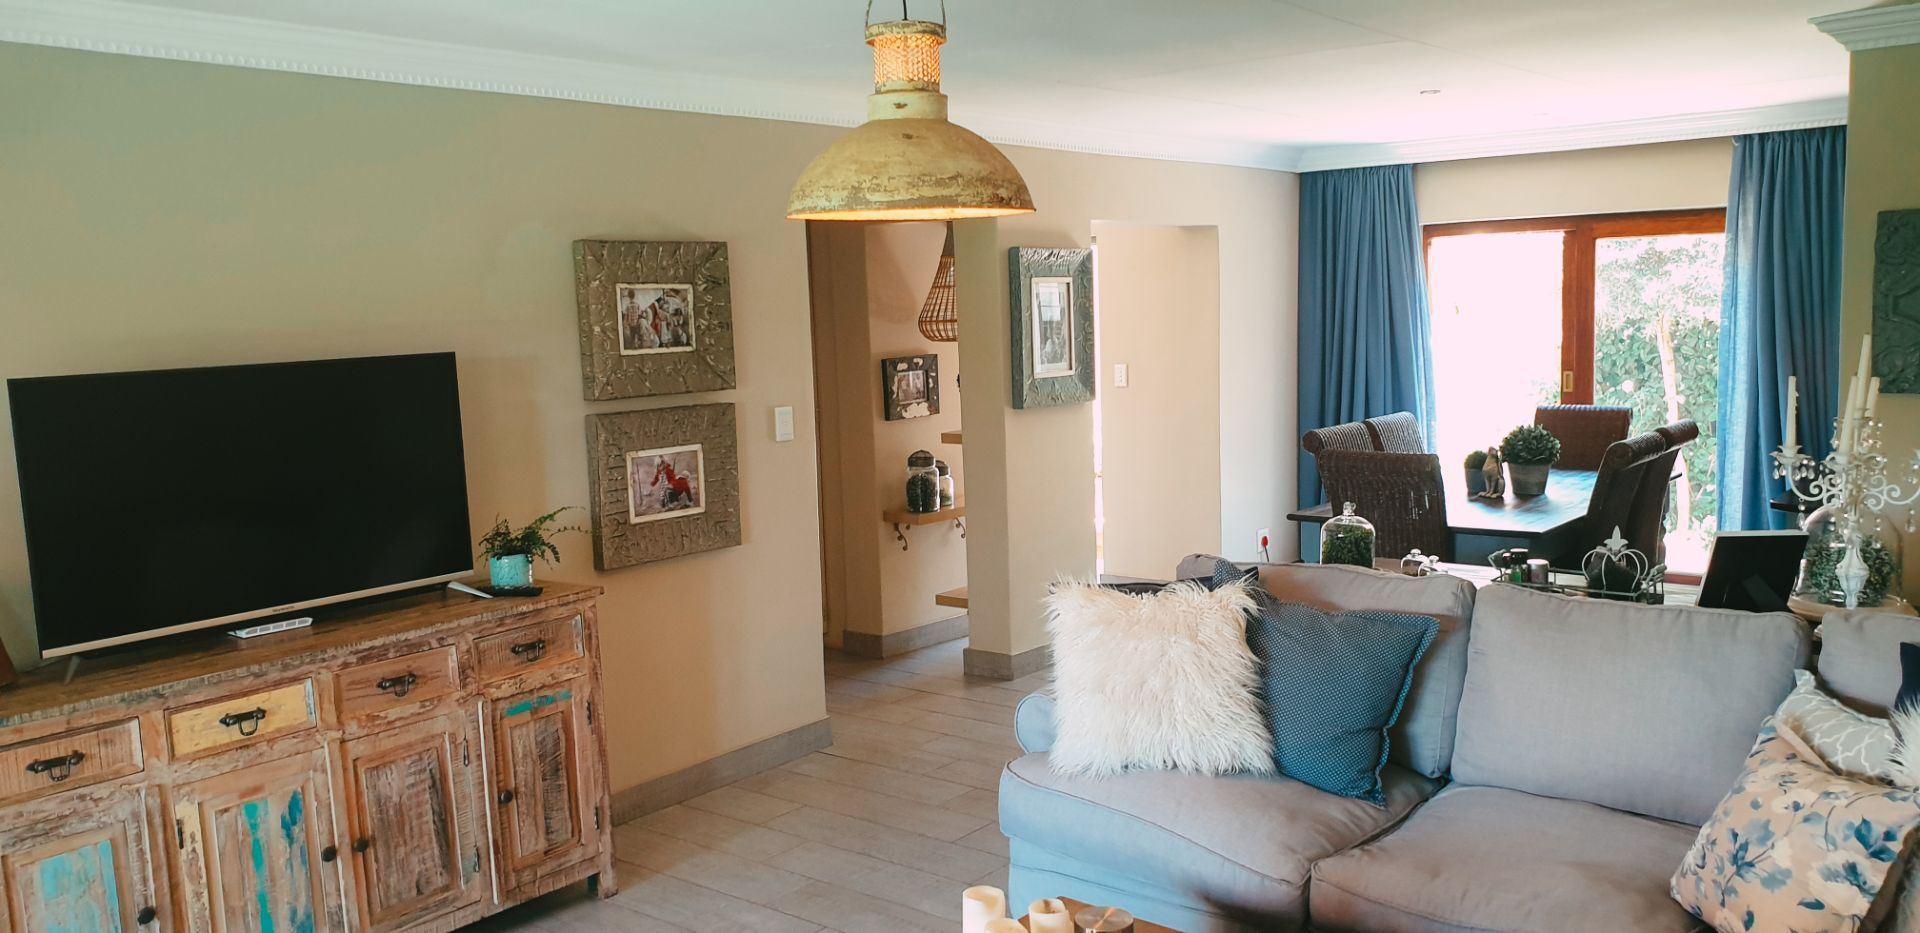 Townhouse Rental Monthly in BOARDWALK MEANDER